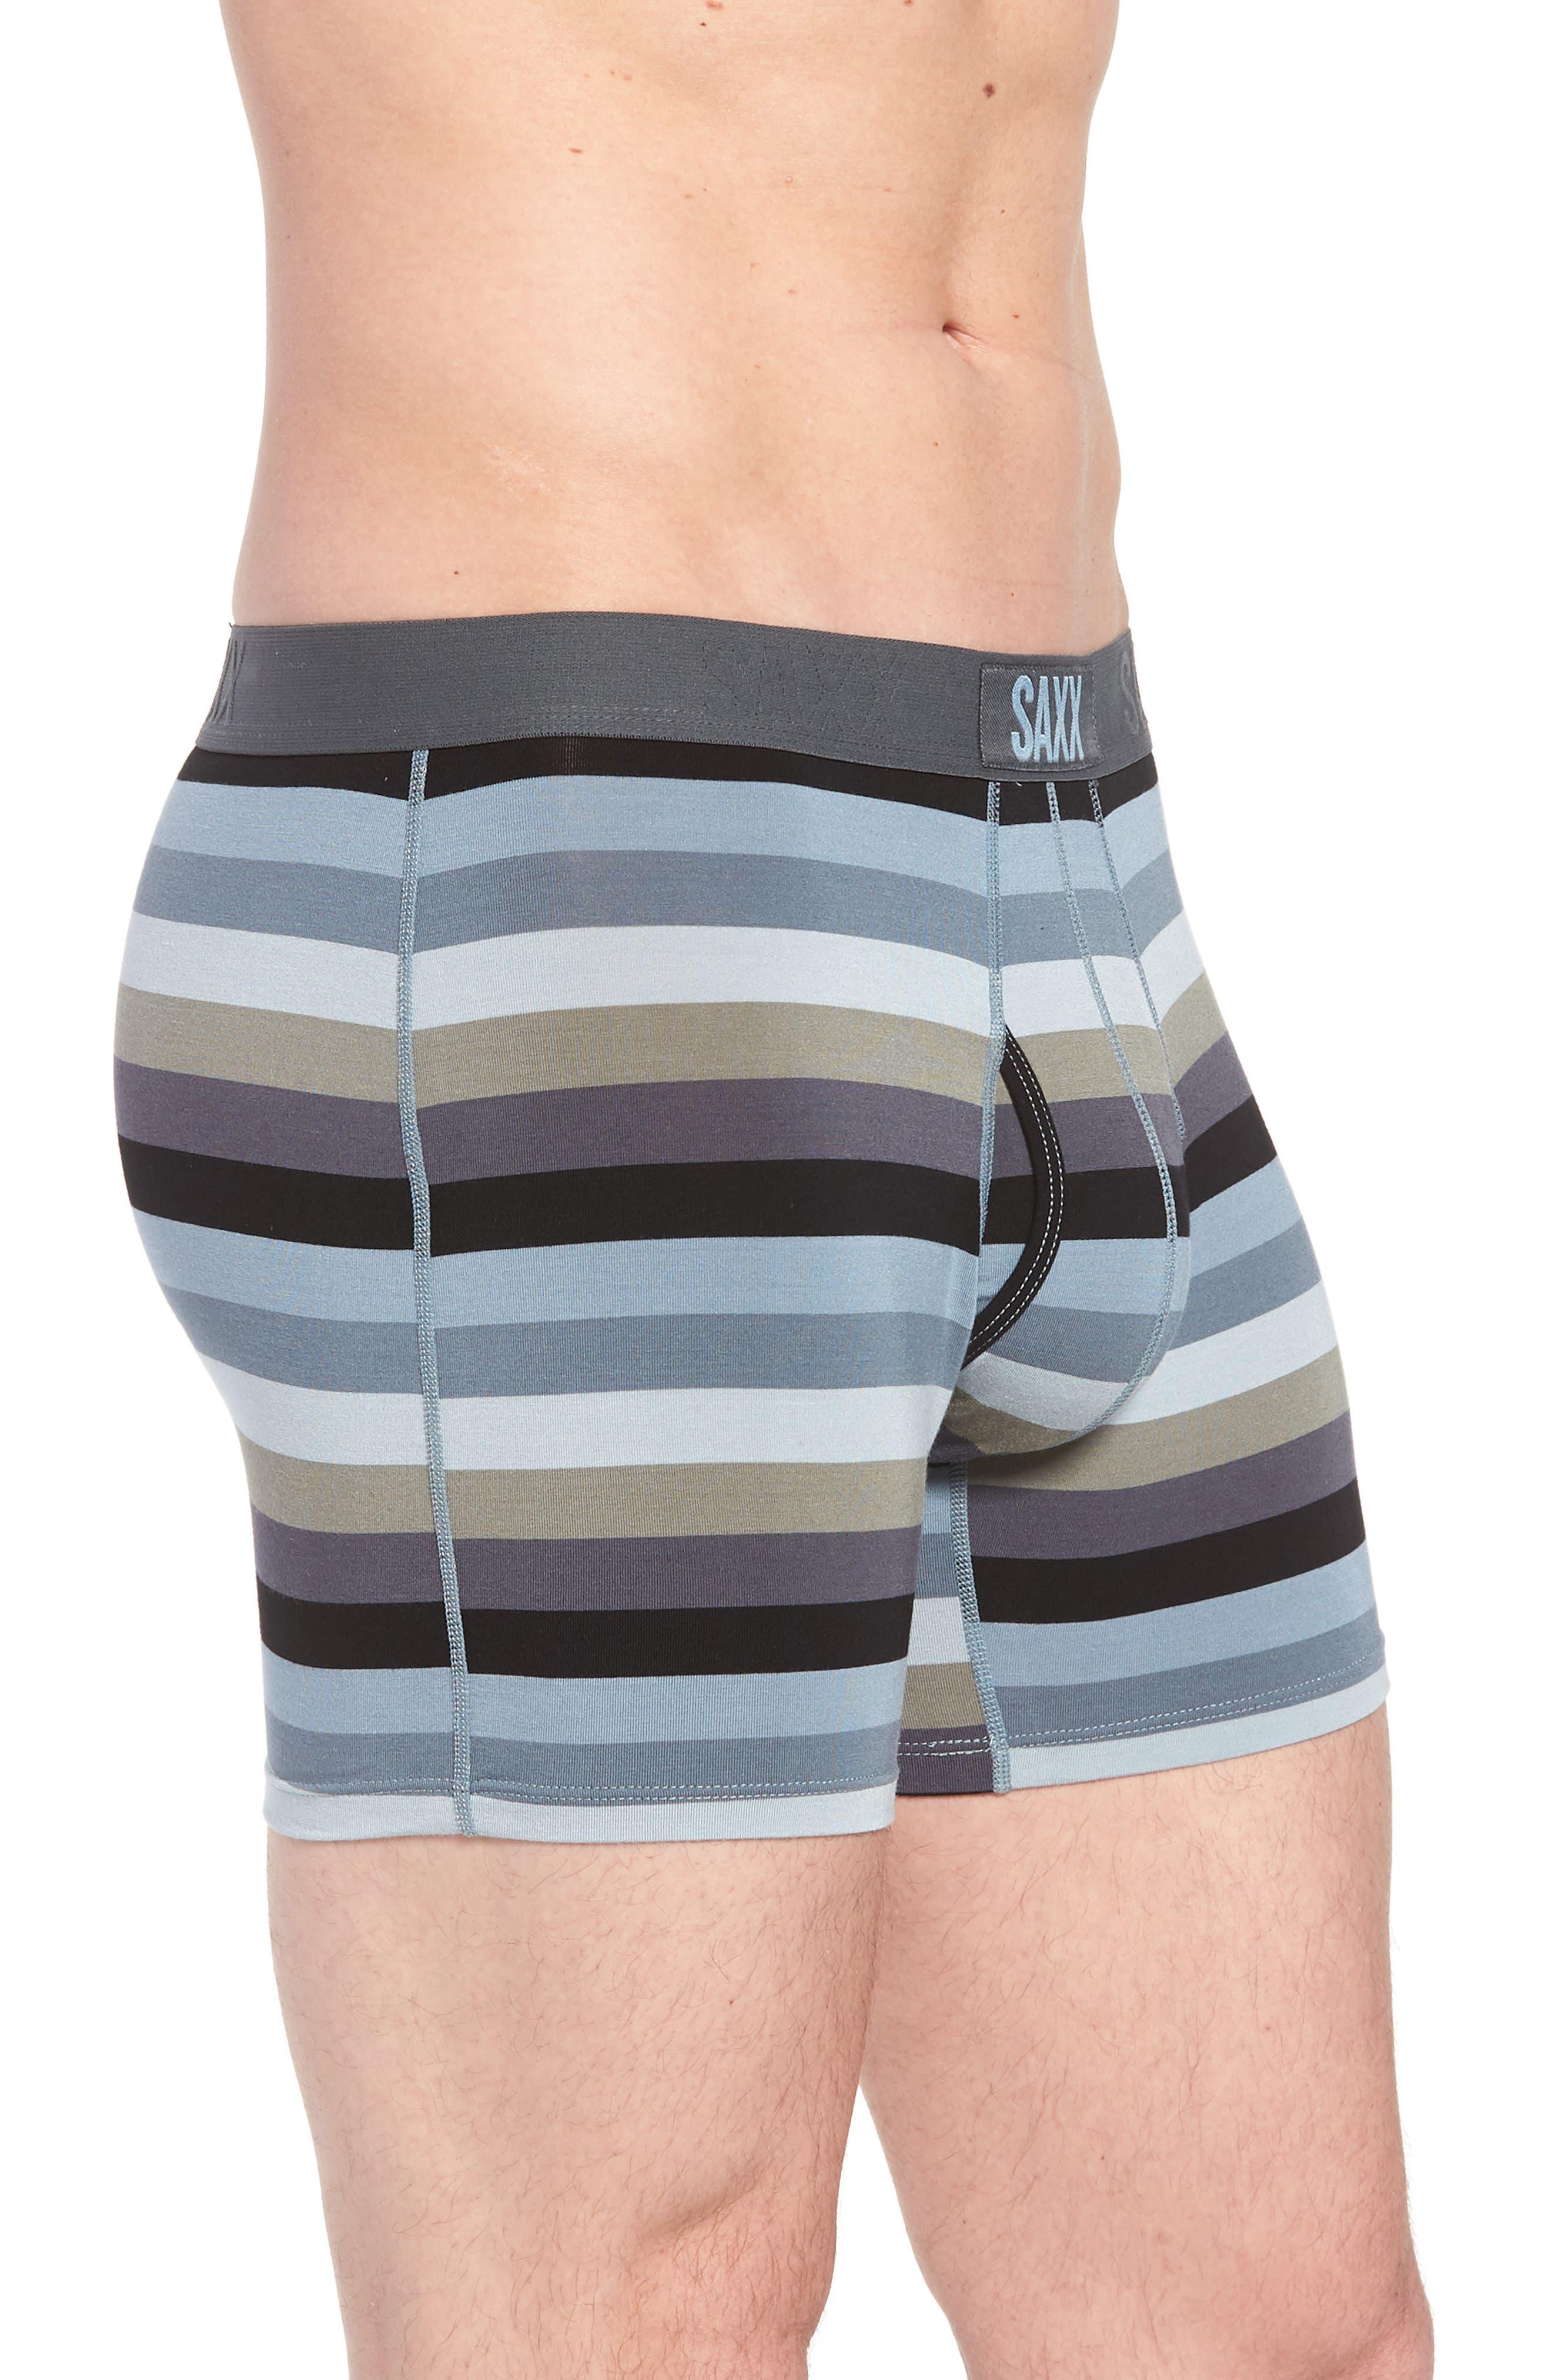 Stripe Boxer Brief,                             Alternate thumbnail 3, color,                             Dark Charcoal Stripe